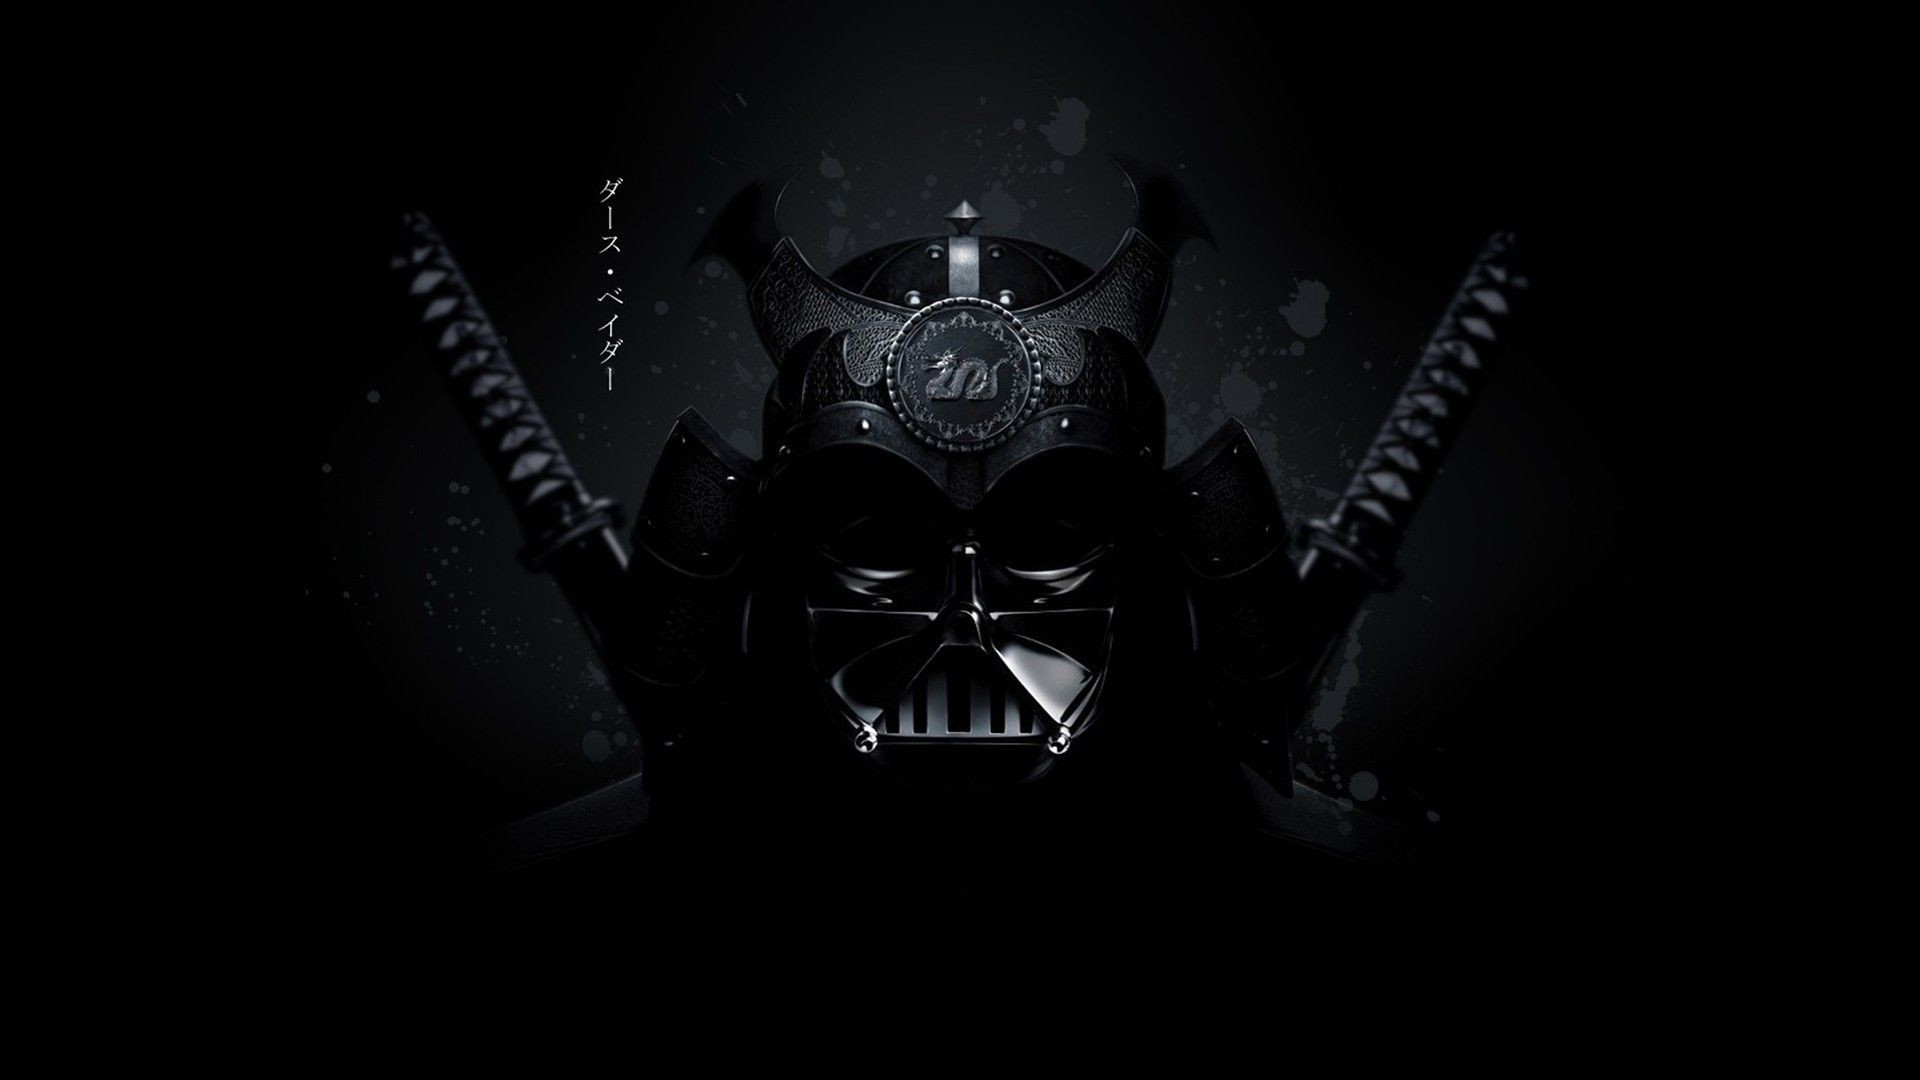 Res: 1920x1080, Wallpapers Darth Vader Render Samurai Star Wars Hd